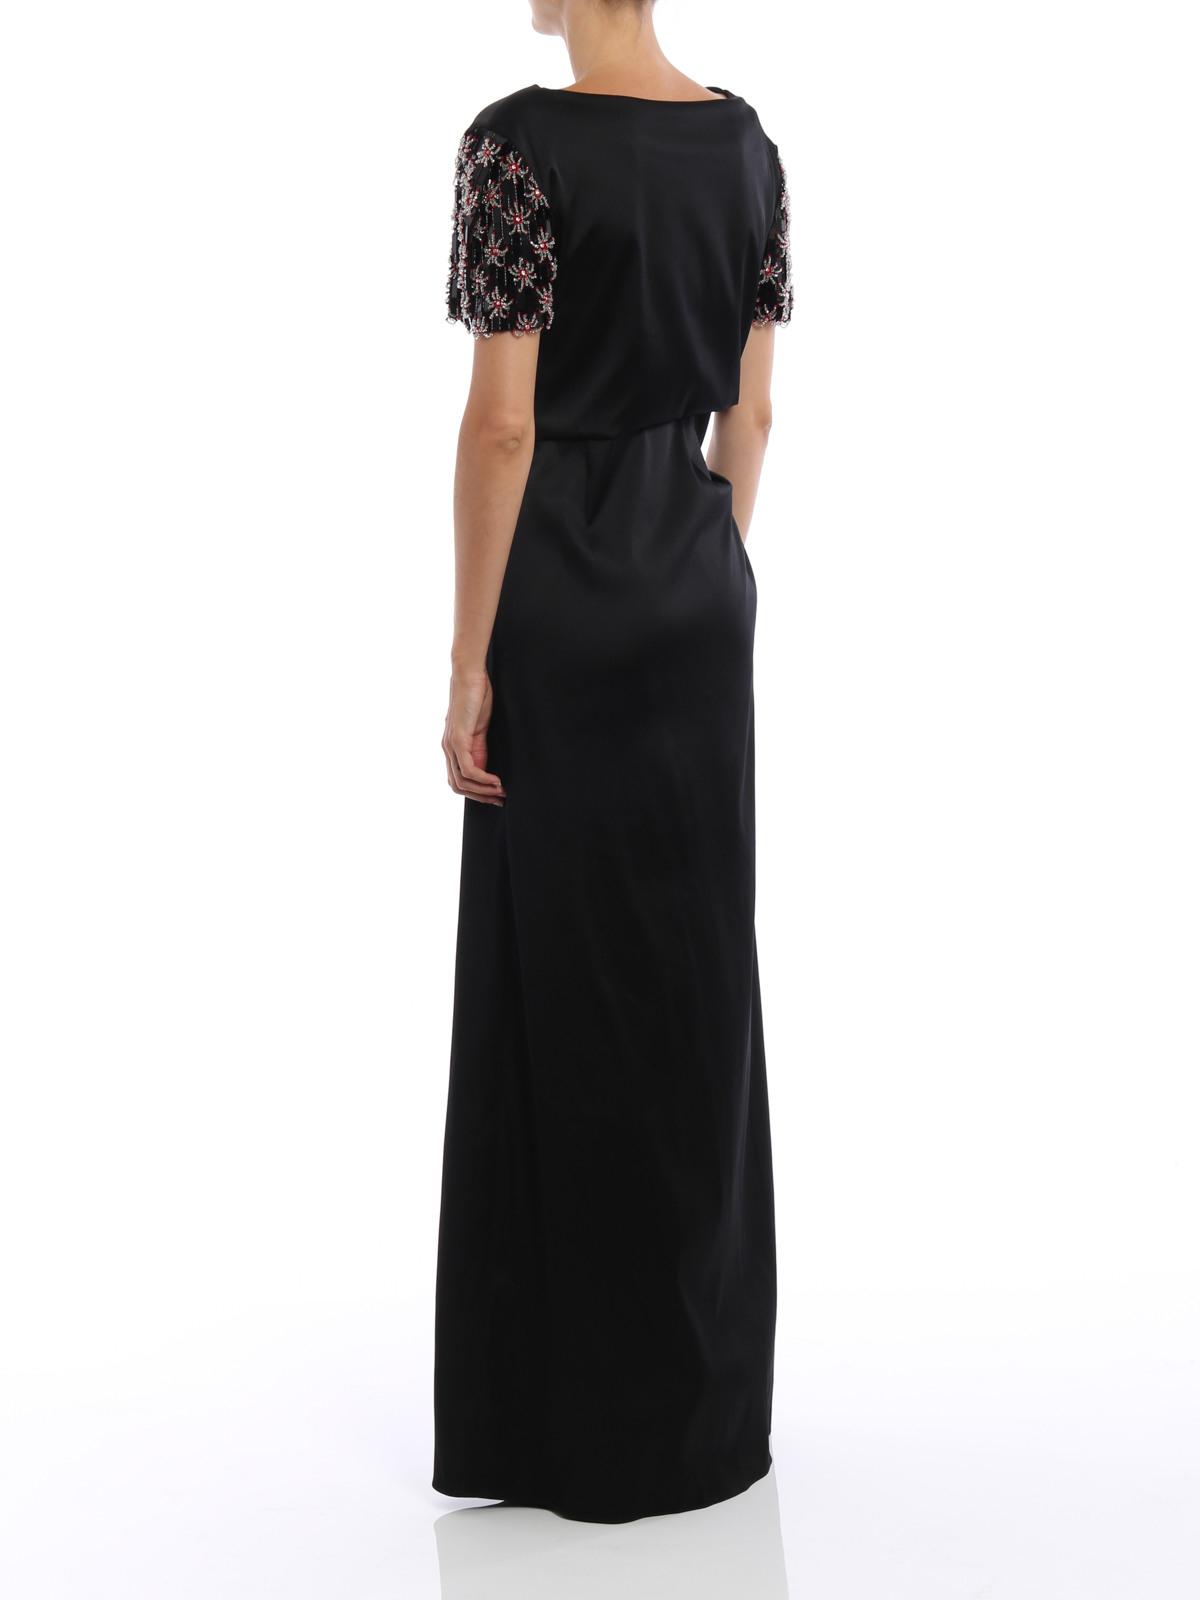 20 Luxus Armani Abendkleid Vertrieb13 Einzigartig Armani Abendkleid Design